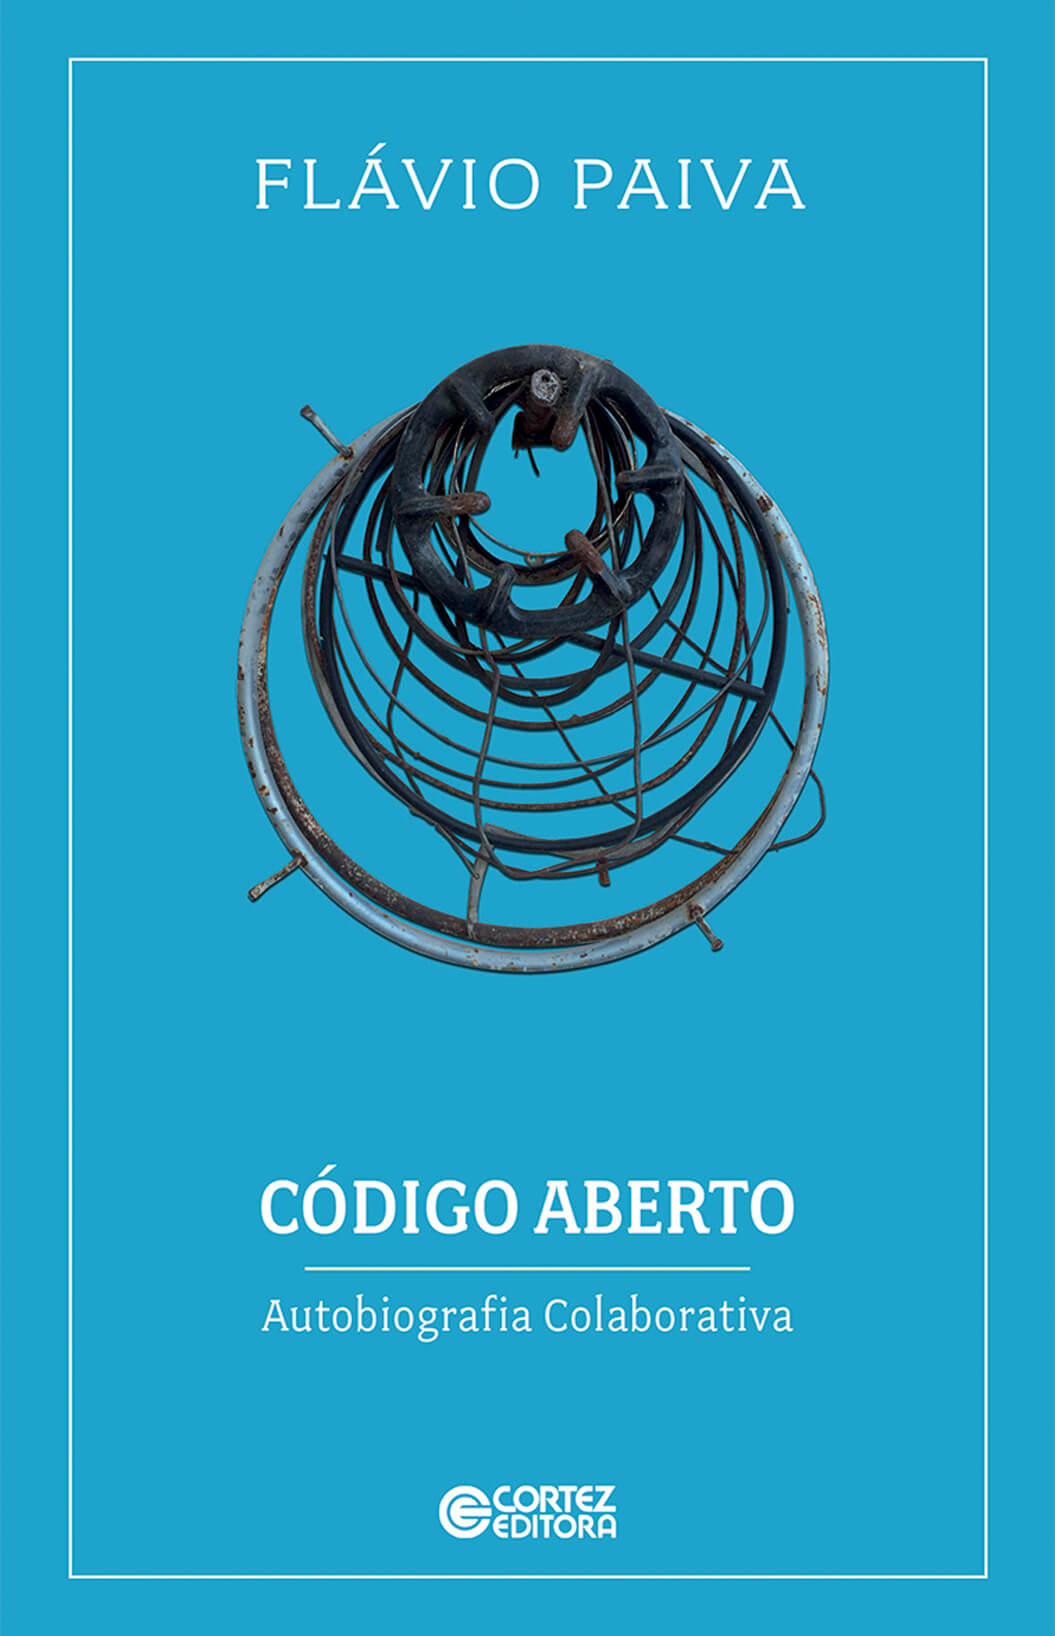 CÓDIGO ABERTO - Autobiografia Colaborativa